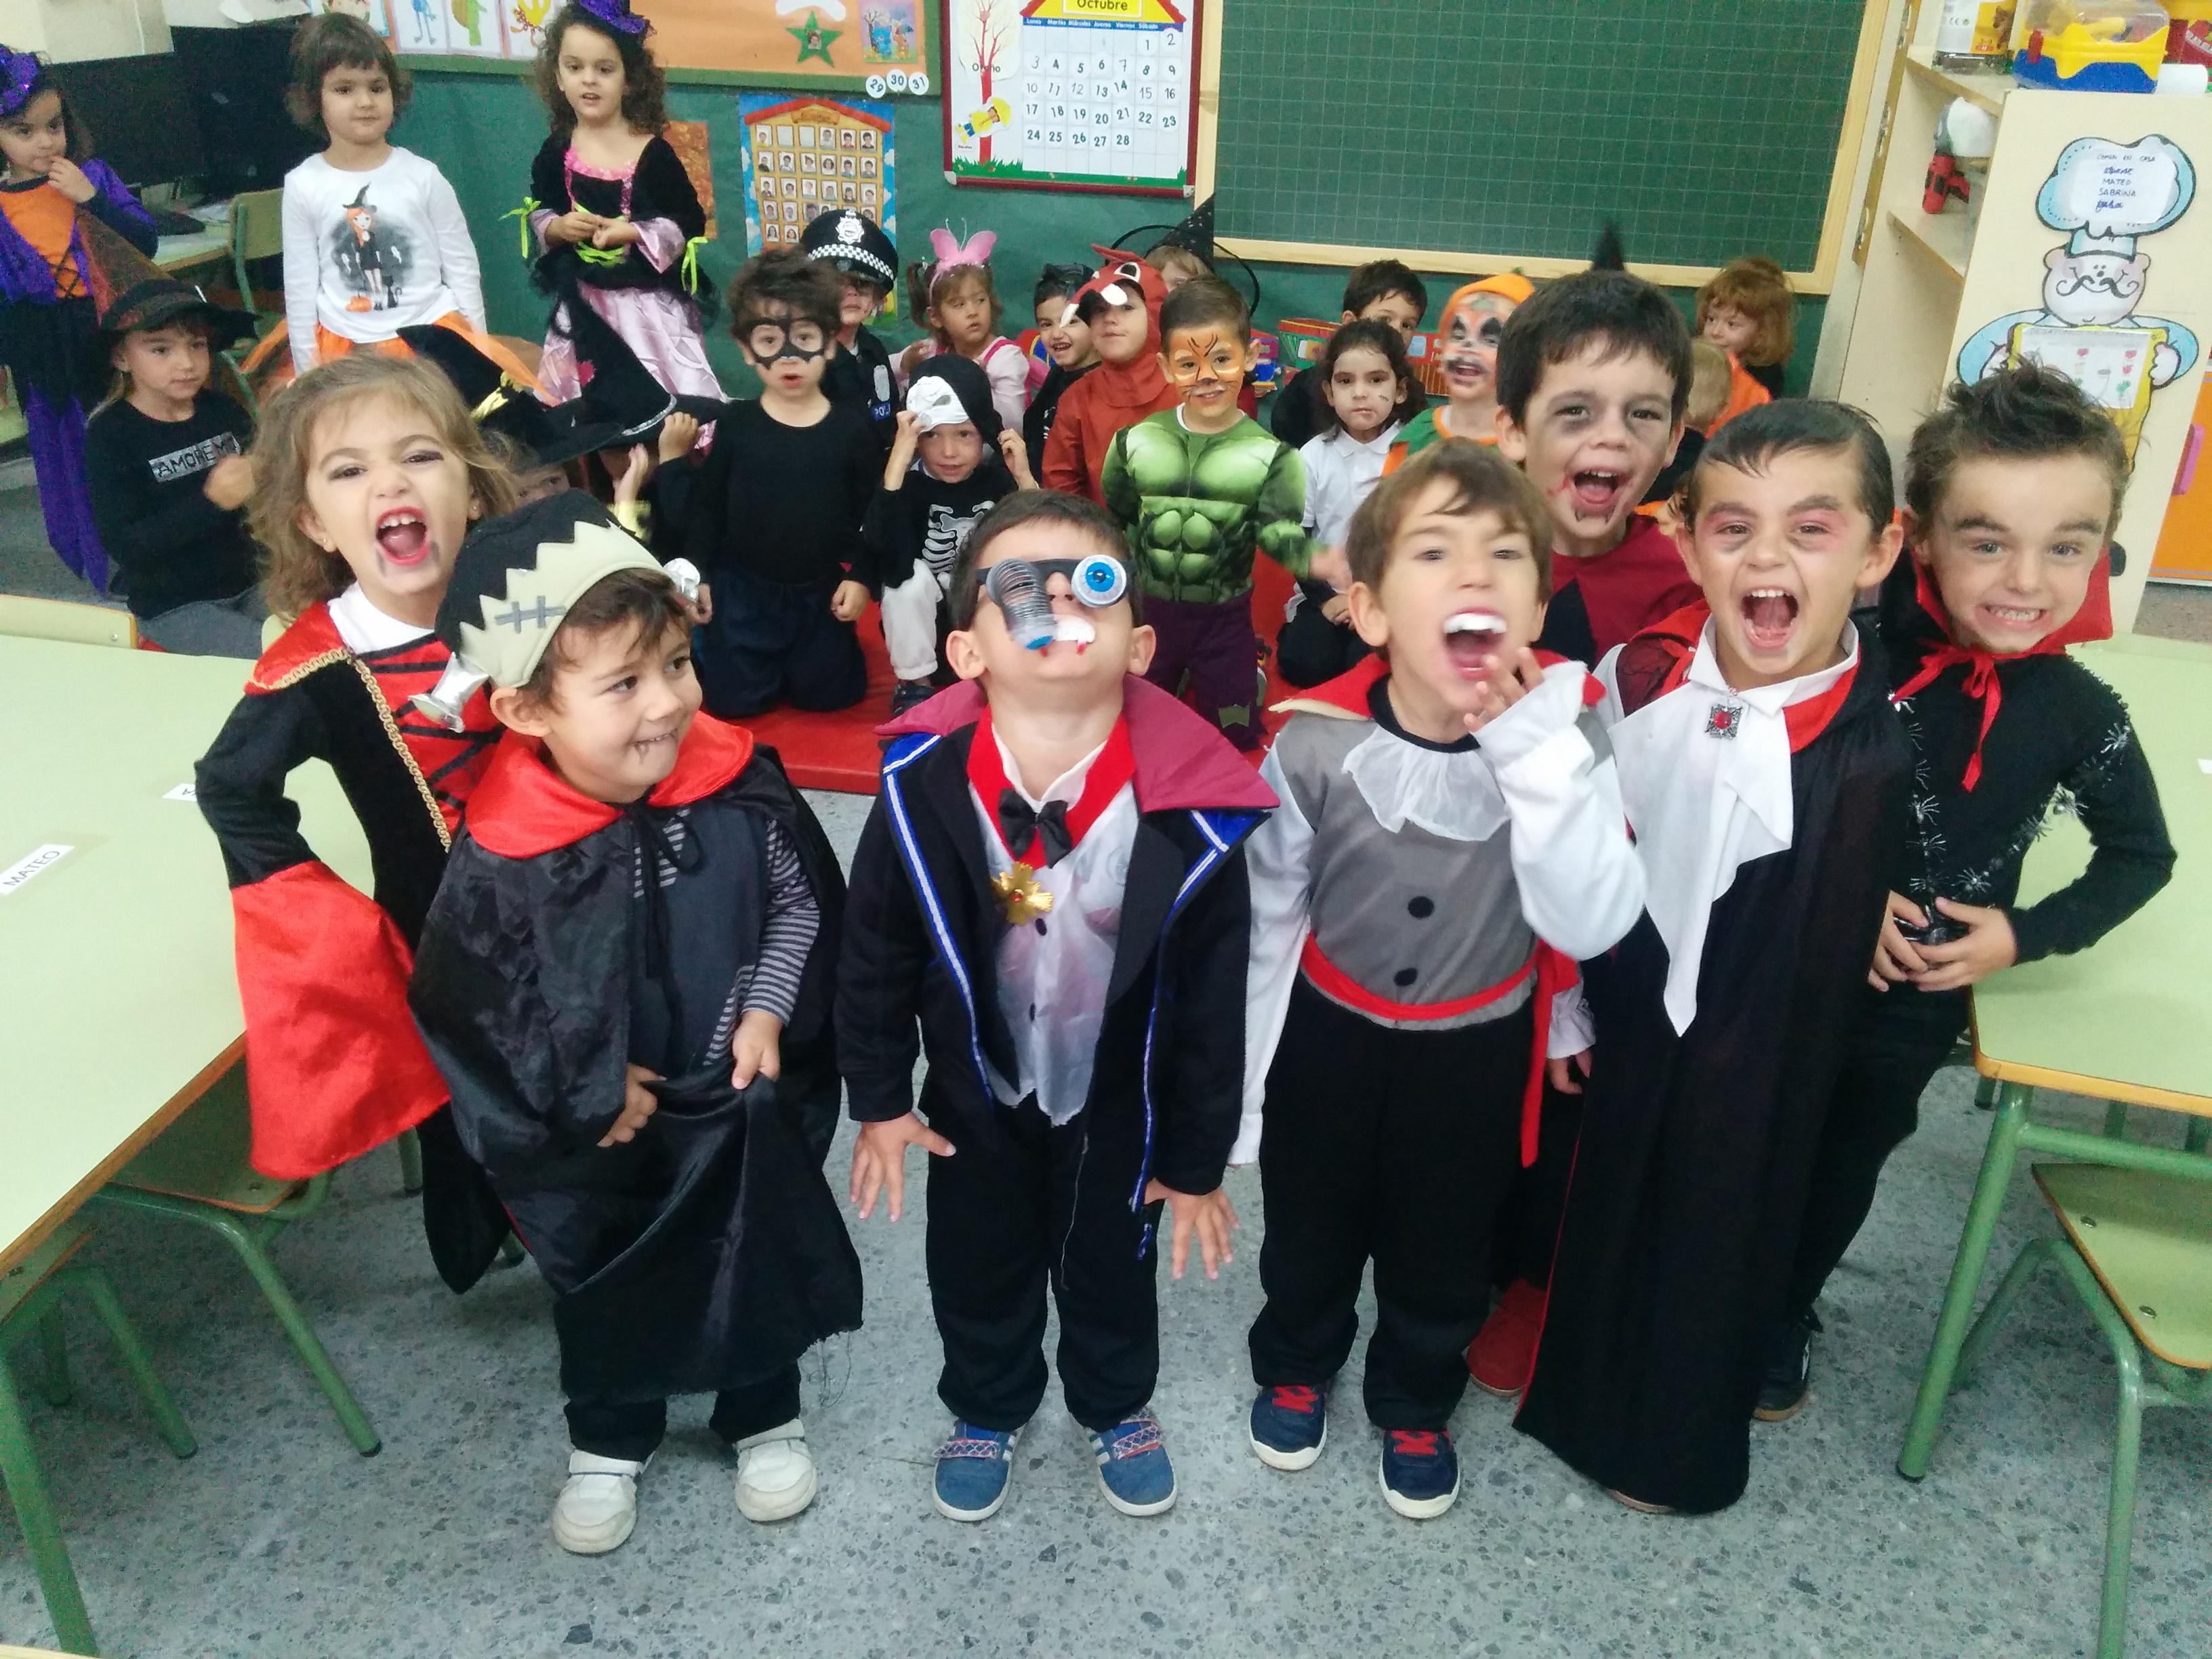 2016_11_INF 4A CELEBRA EL OTOÑO Y HALLOWEEN 17